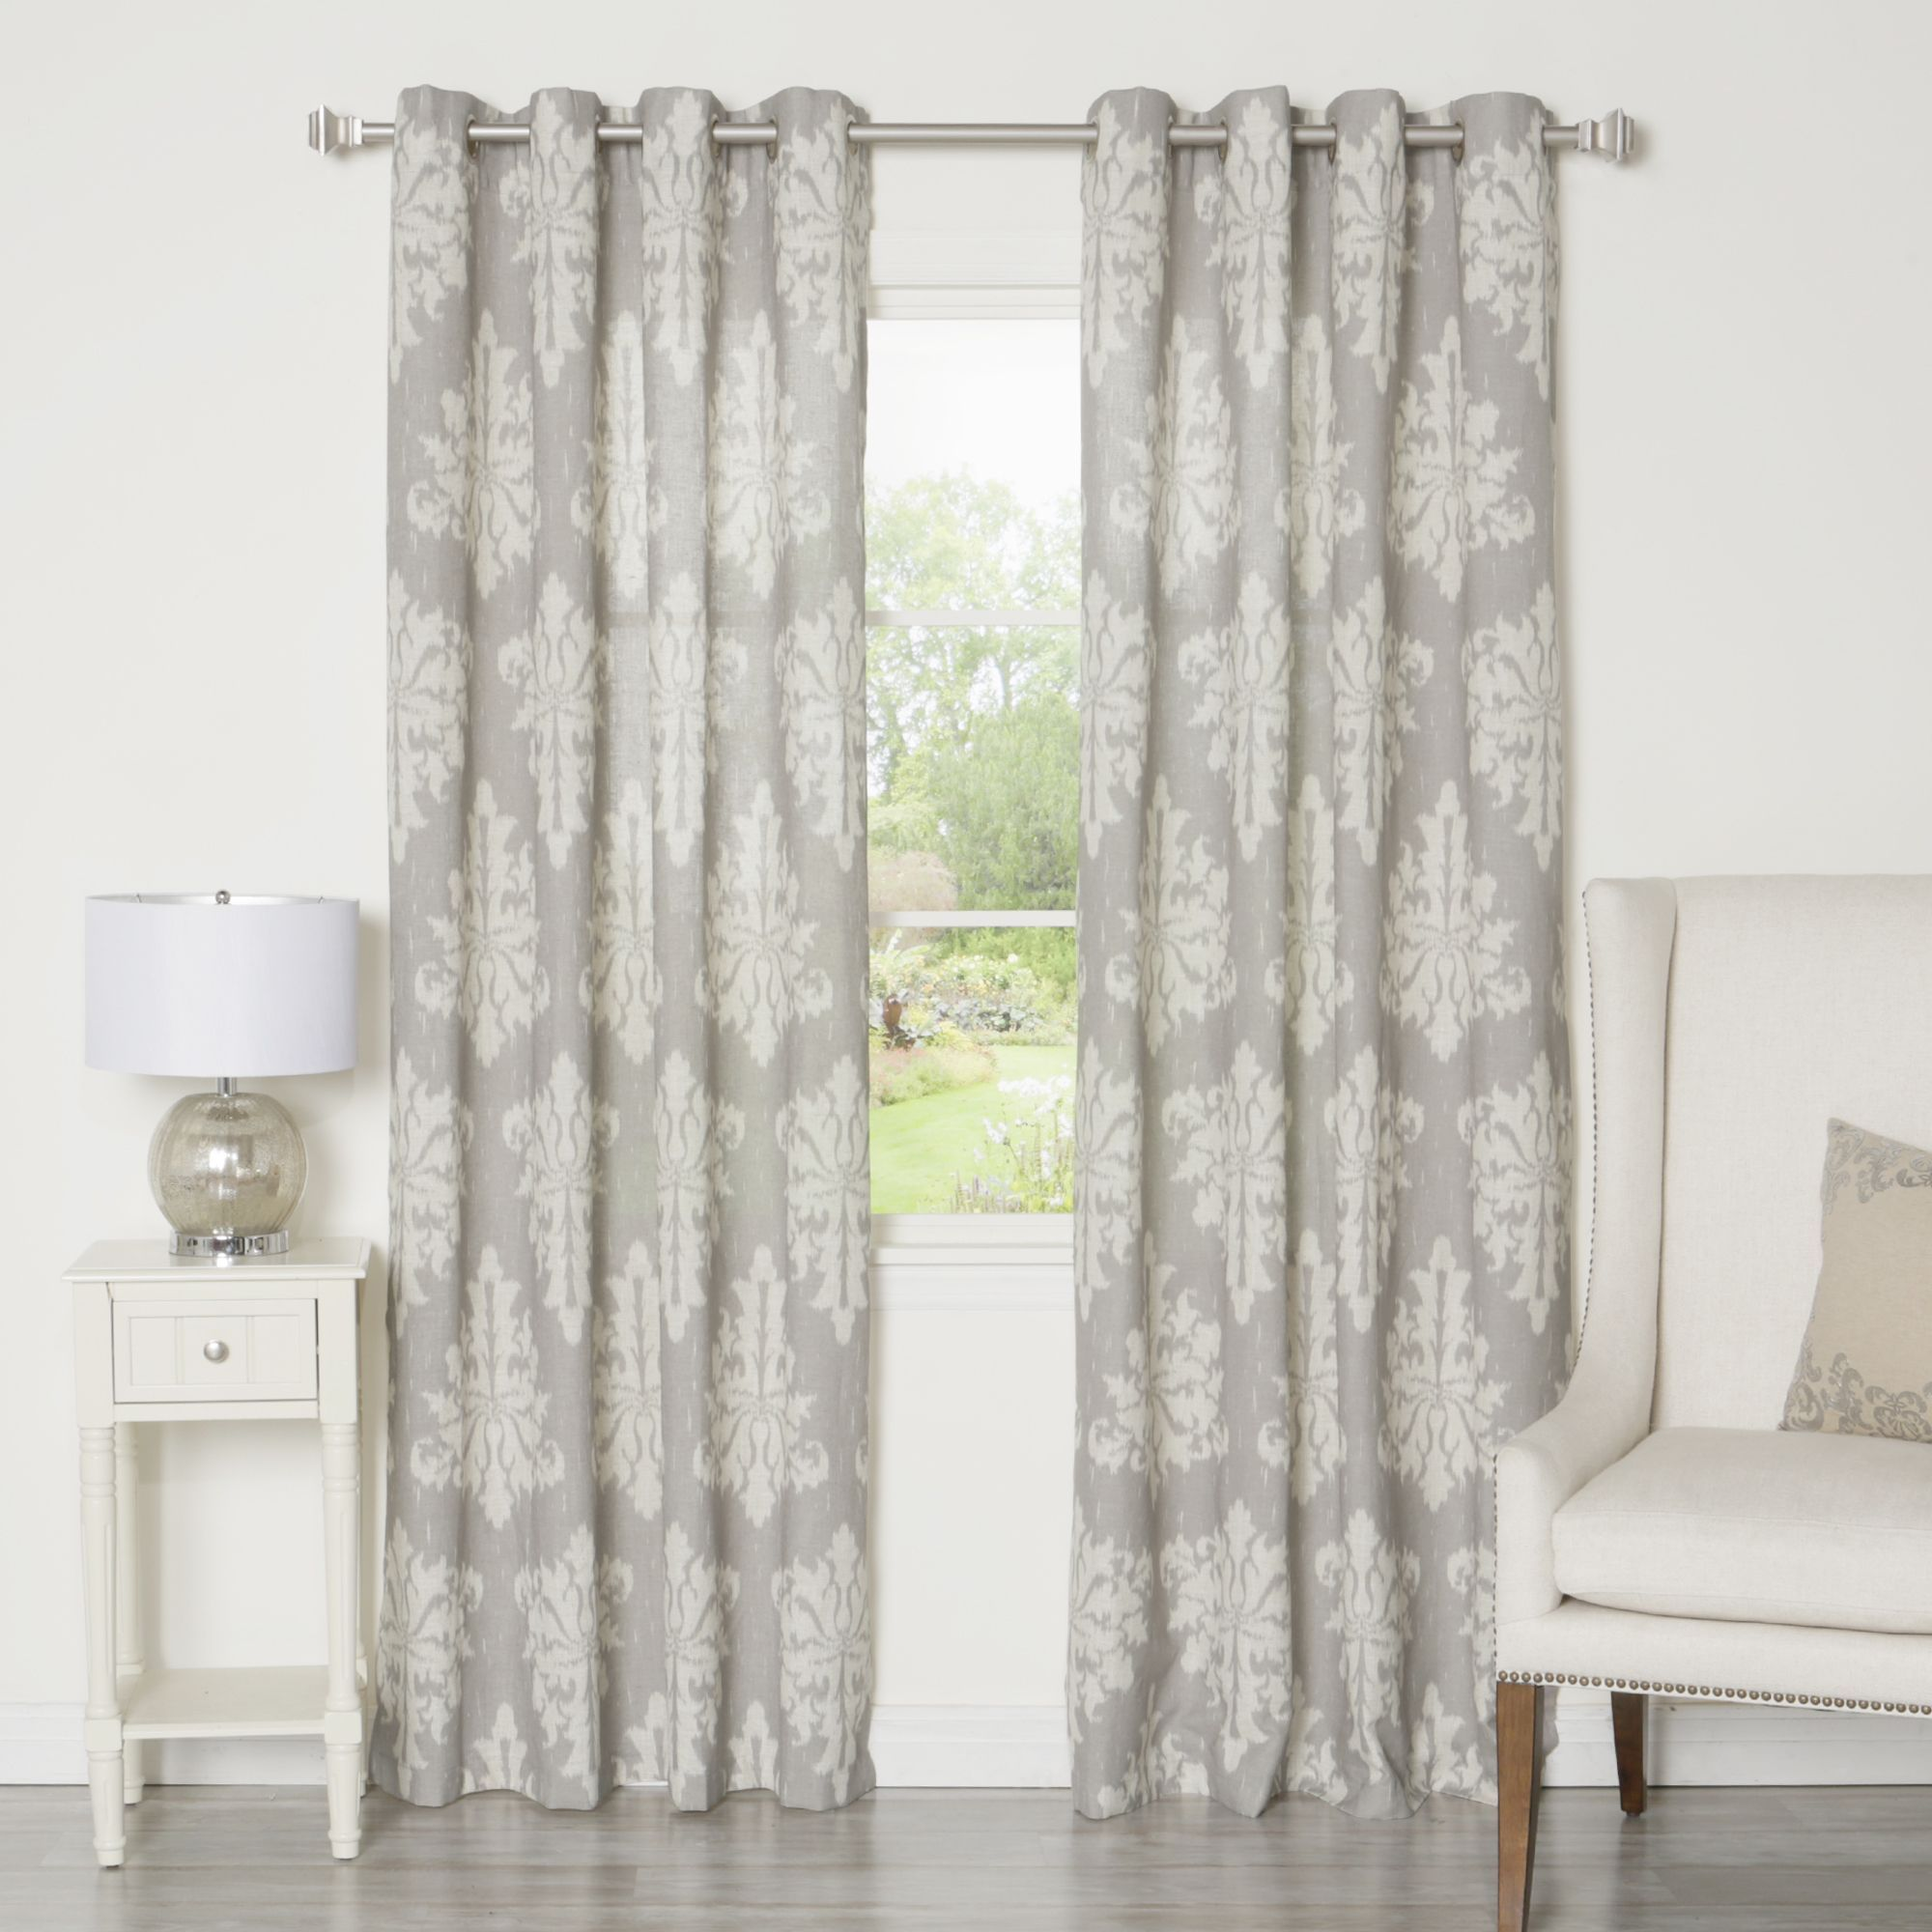 Aurora Home Ikat Linen Grommet Top 84 Inch Curtain Panel Pair 52